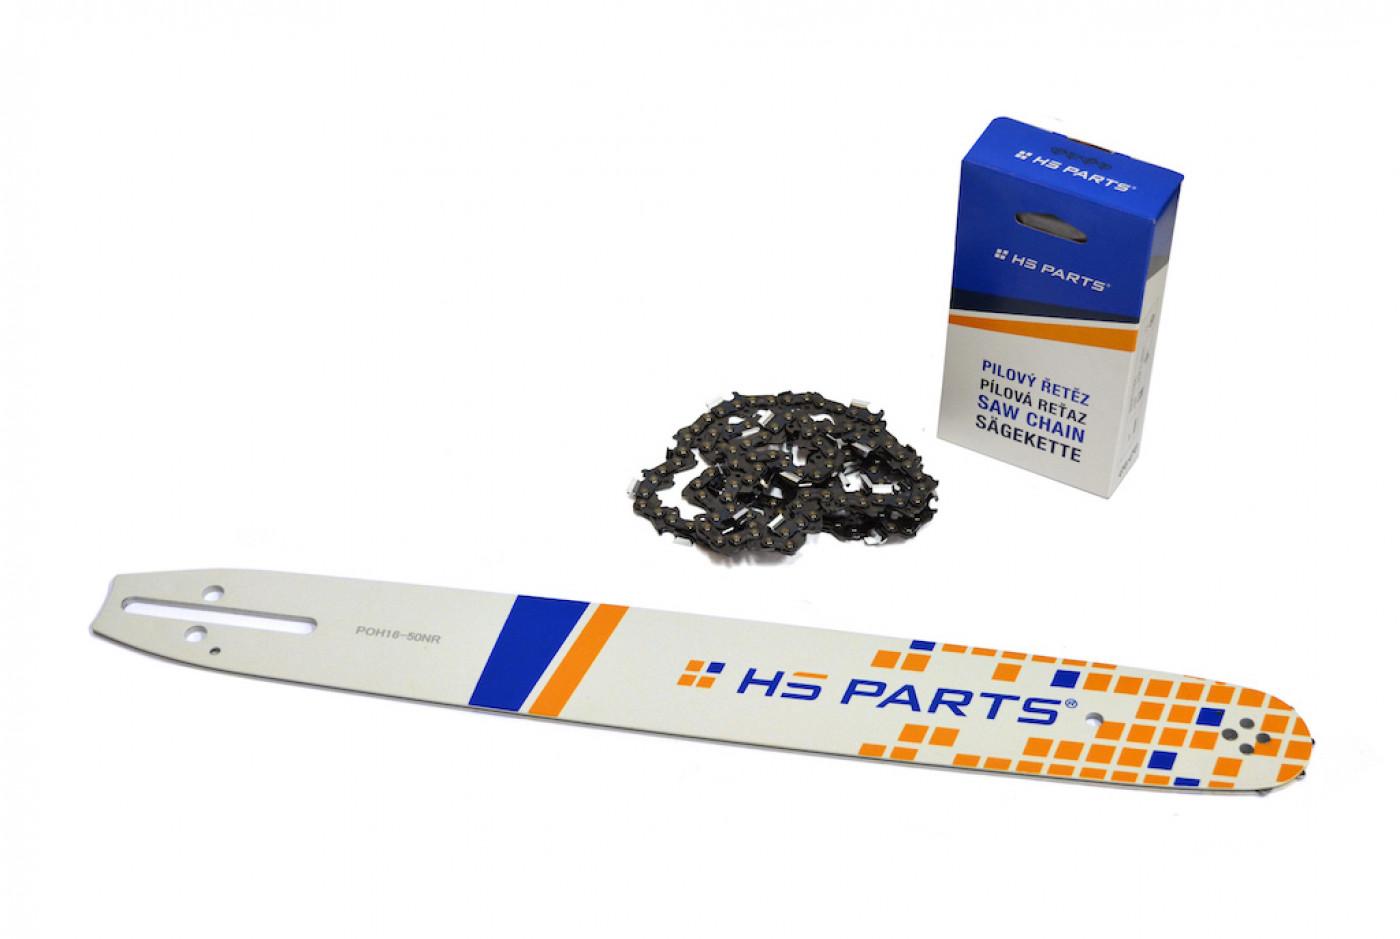 Lišta 40cm + reťaz 56 čl. 3 8 1,3mm + Ozubenie Partner 350 351 370 390 420